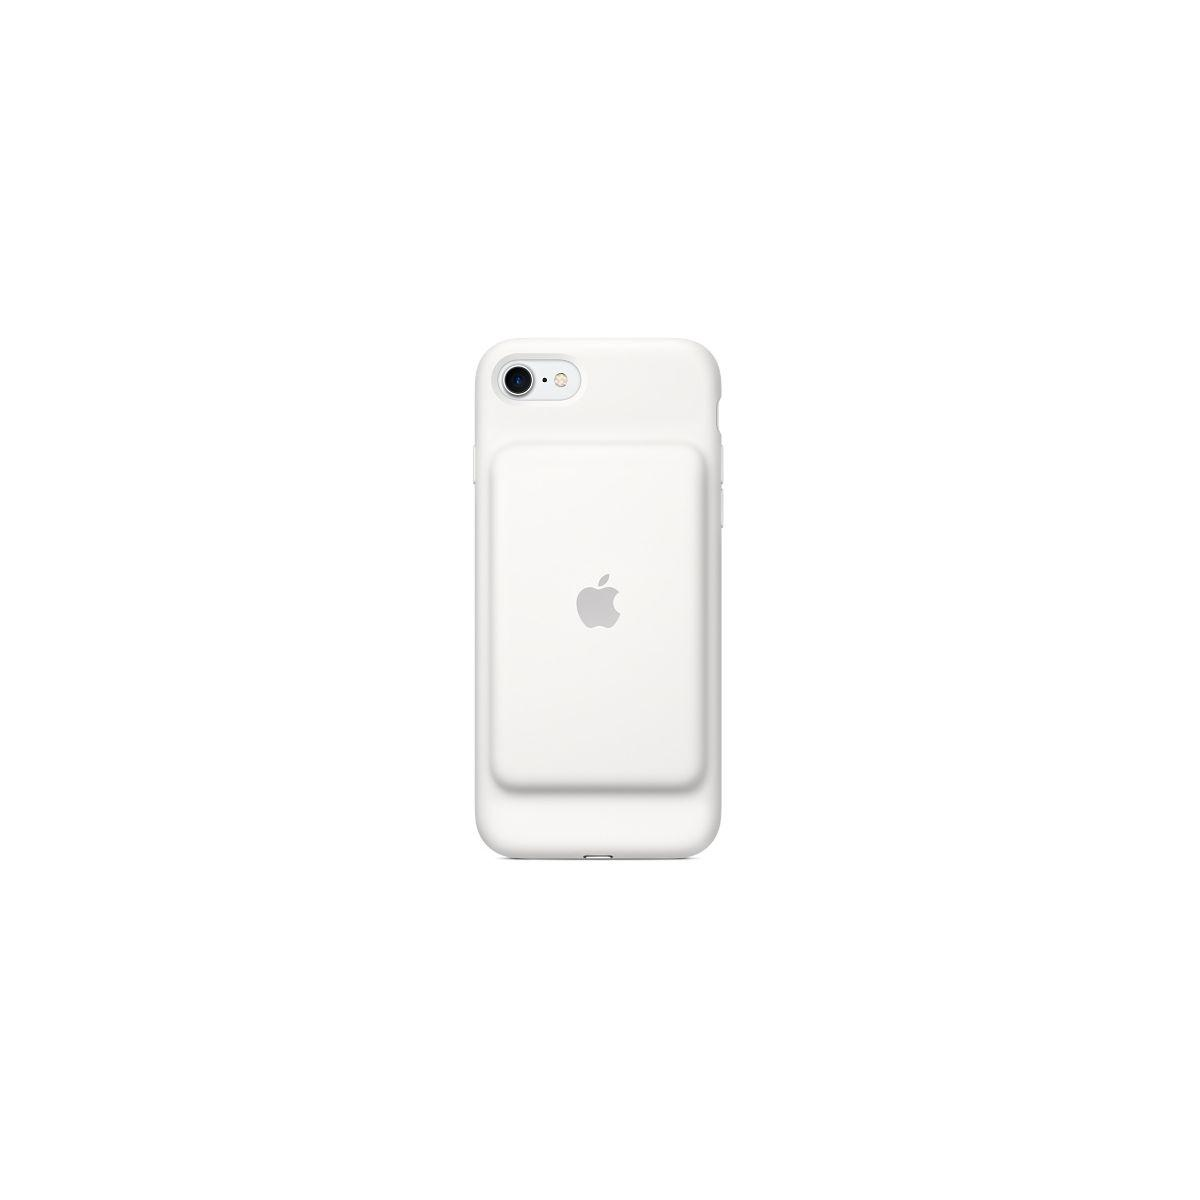 Coque apple iphone 7 smart battery case - livraison offerte : code chronoff